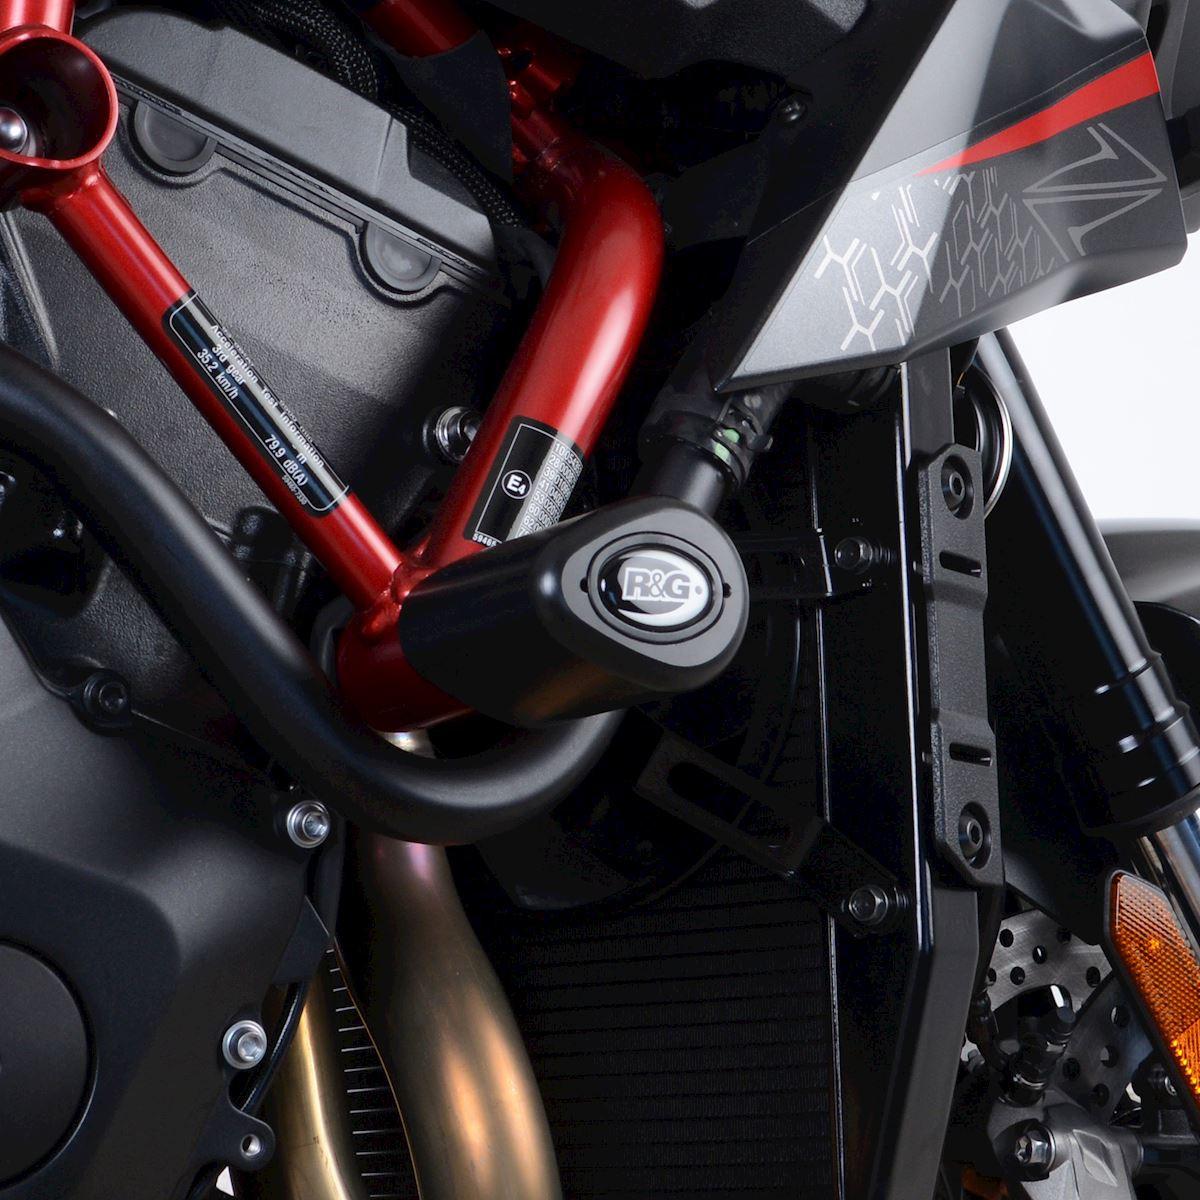 H2Racing 2 St/ück Motorrad Sturzschutz Sturzpads Rahmen Crashpads Protektoren f/ür Yama-ha MT-07 FZ07 XSR 700 Tracer 700 2014-2018